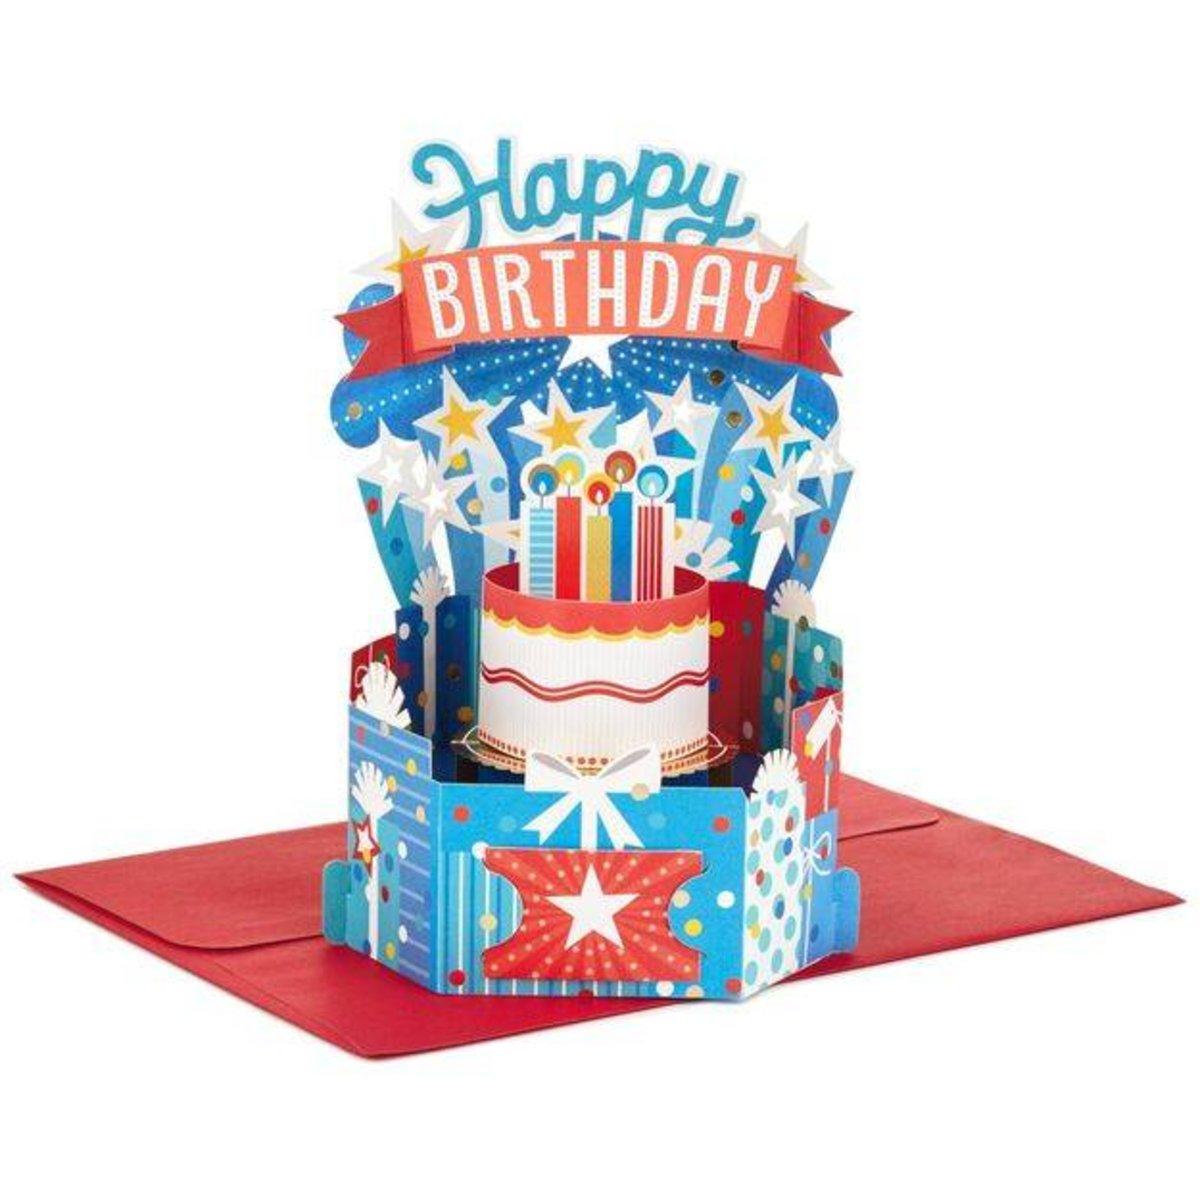 Hallmark Colorful Birthday Celebration Pop Up Card